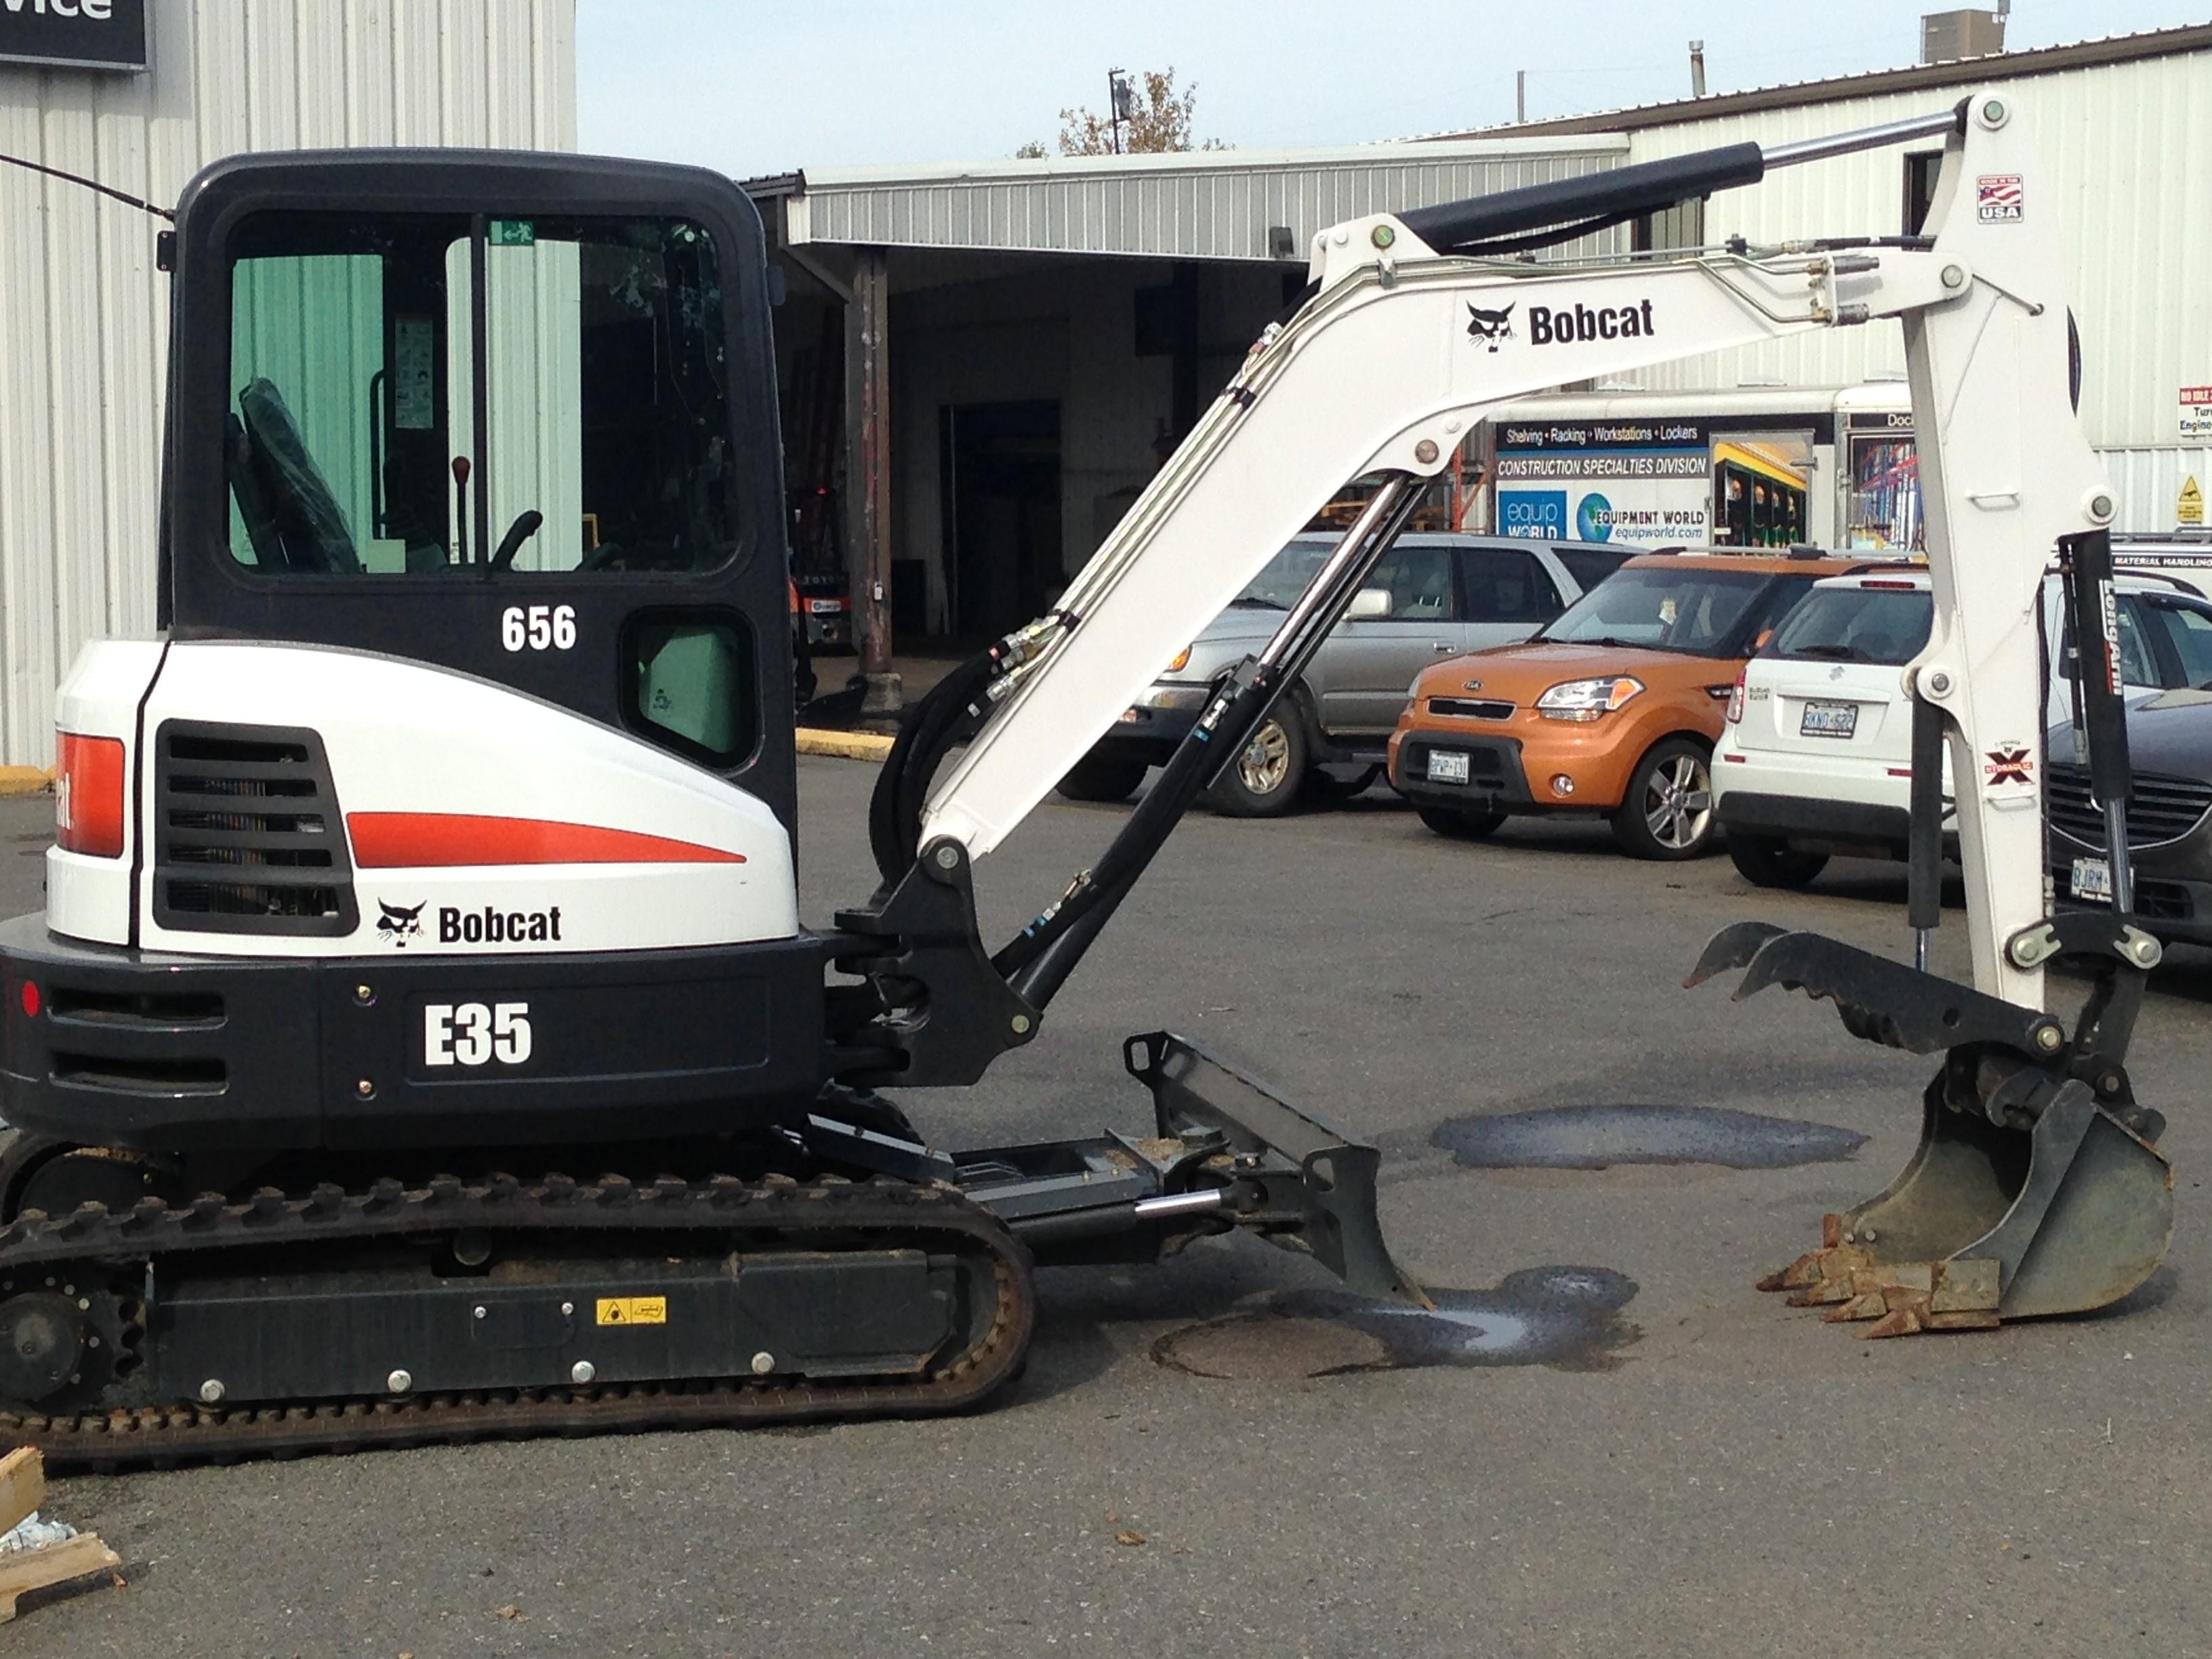 Used, 2016, Bobcat, E35 T4 Long Arm, Excavators